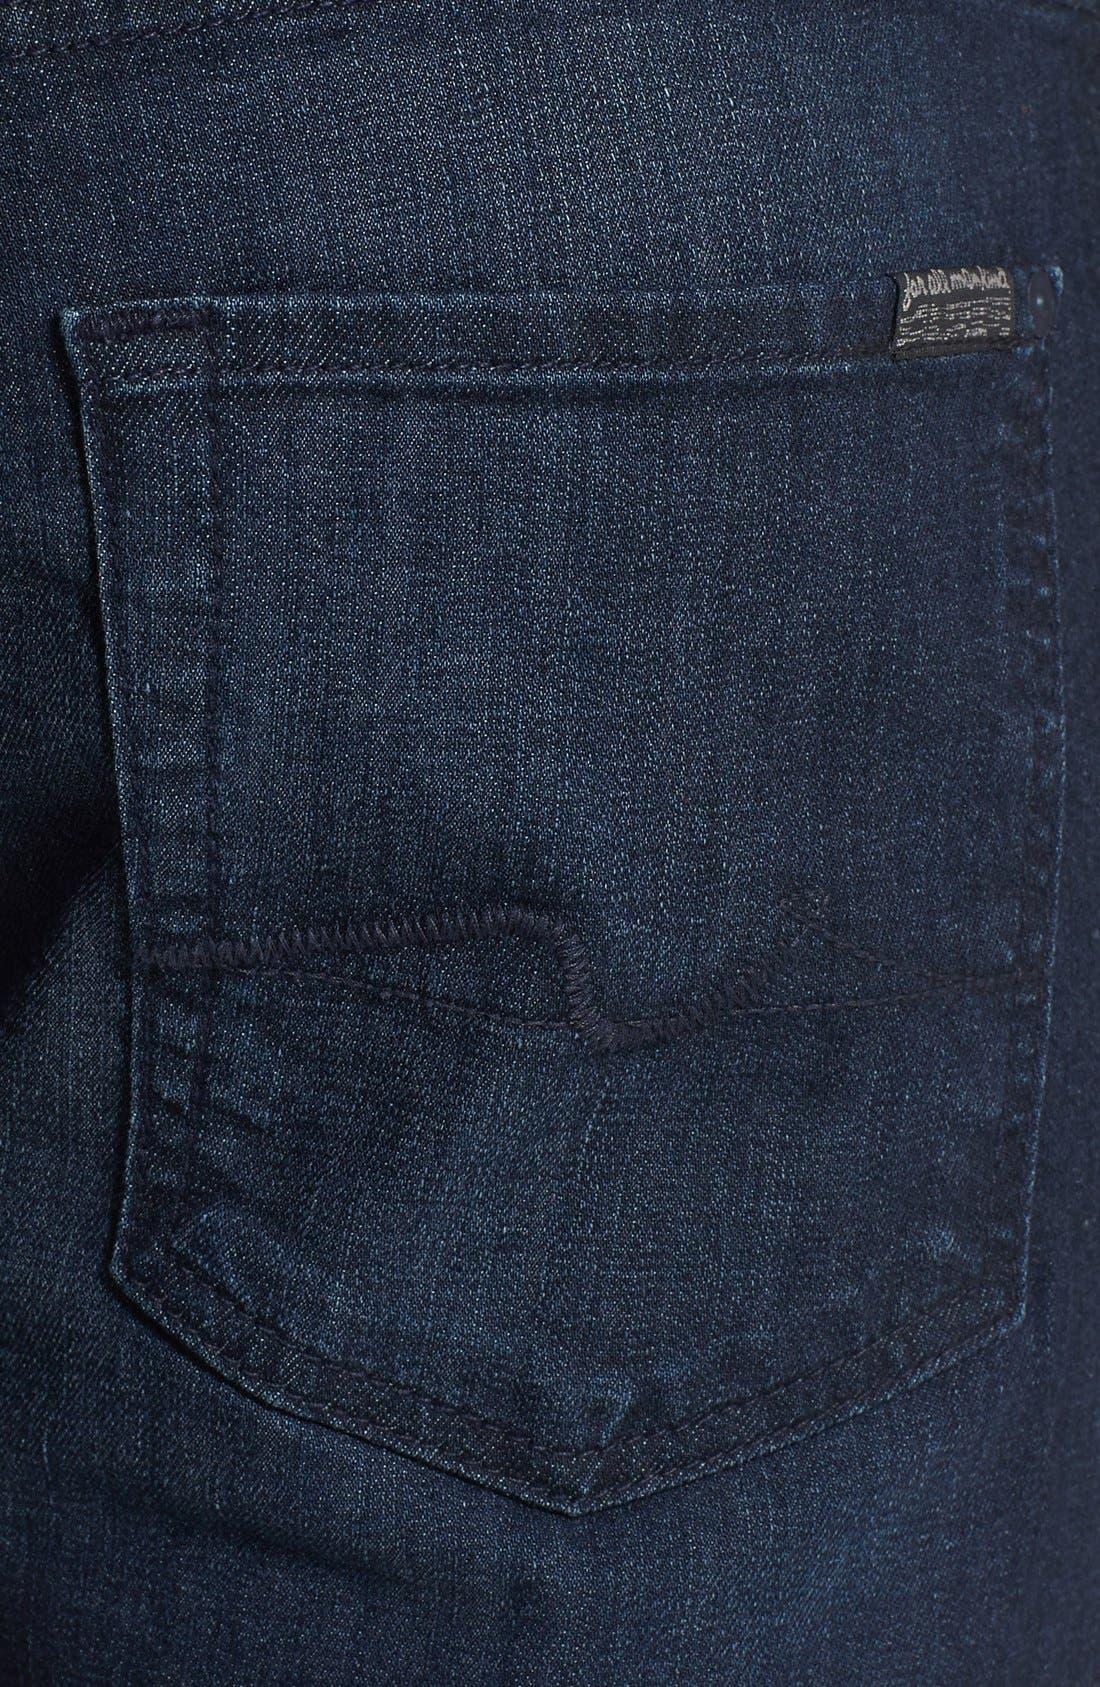 Alternate Image 4  - 7 For All Mankind® 'Brett' Bootcut Jeans (Sunset Hill Blue) (Online Only)